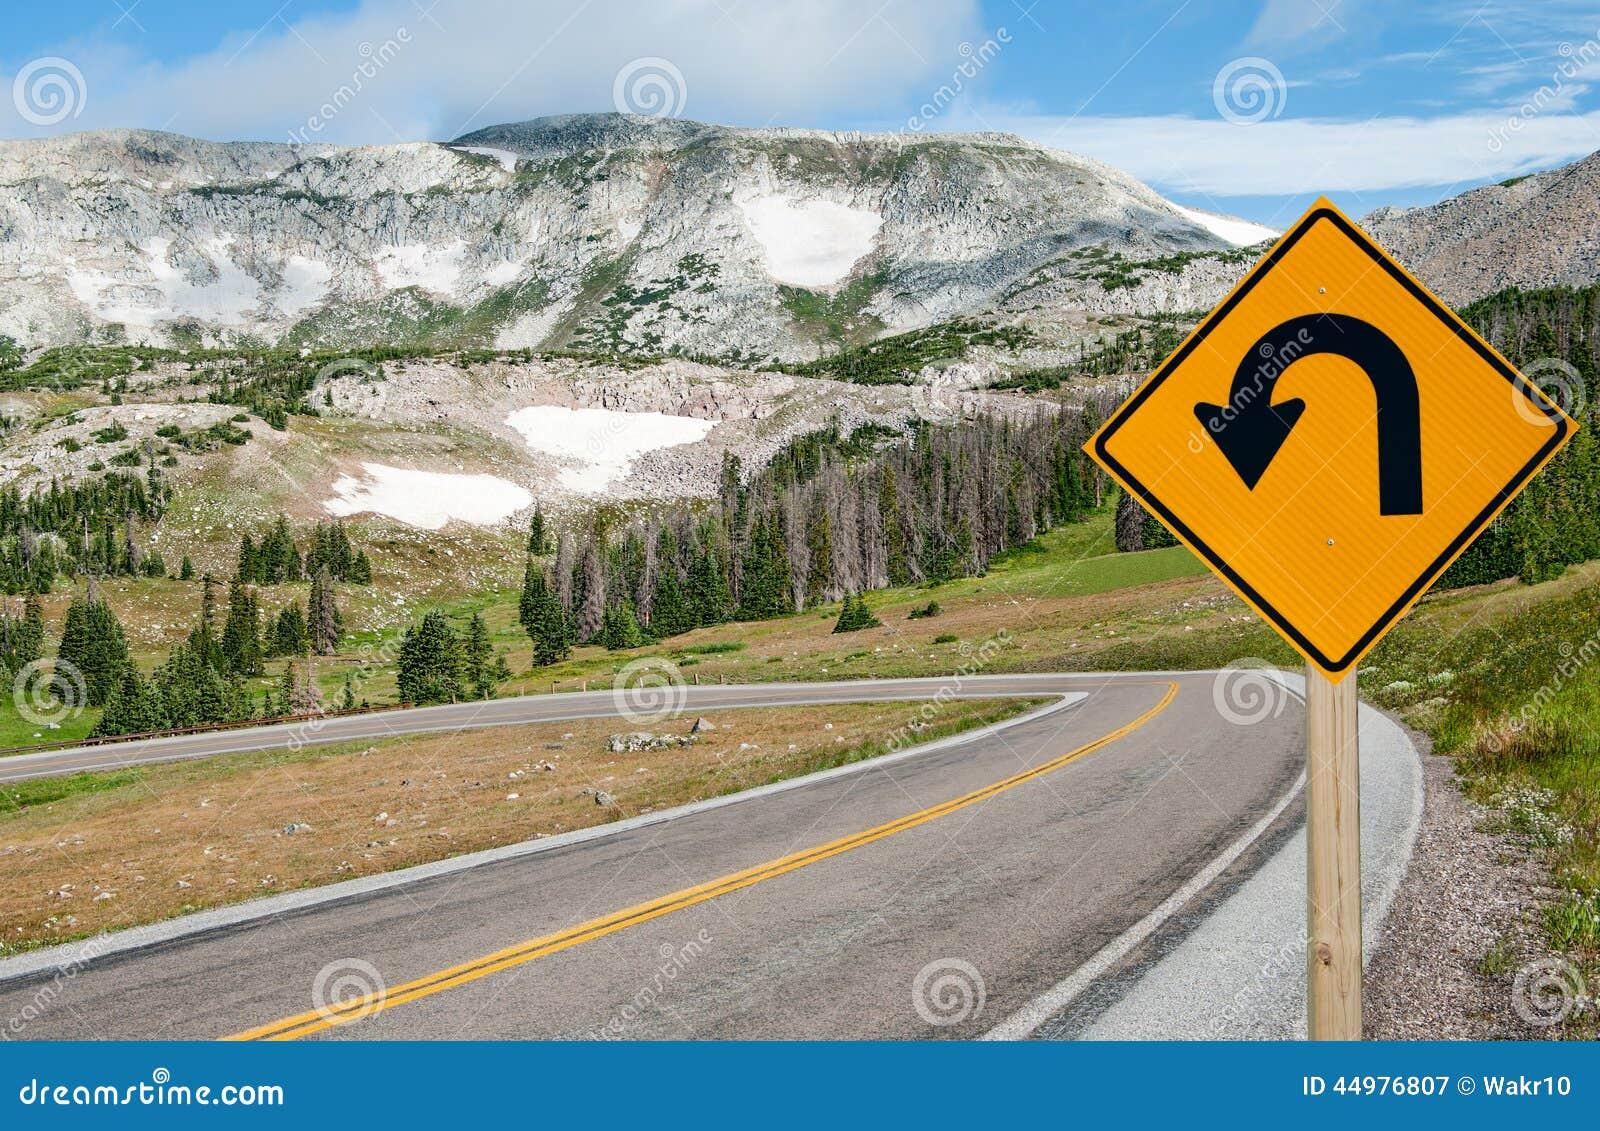 Turn around sign stock image image 35488961 - Royalty Free Stock Photo